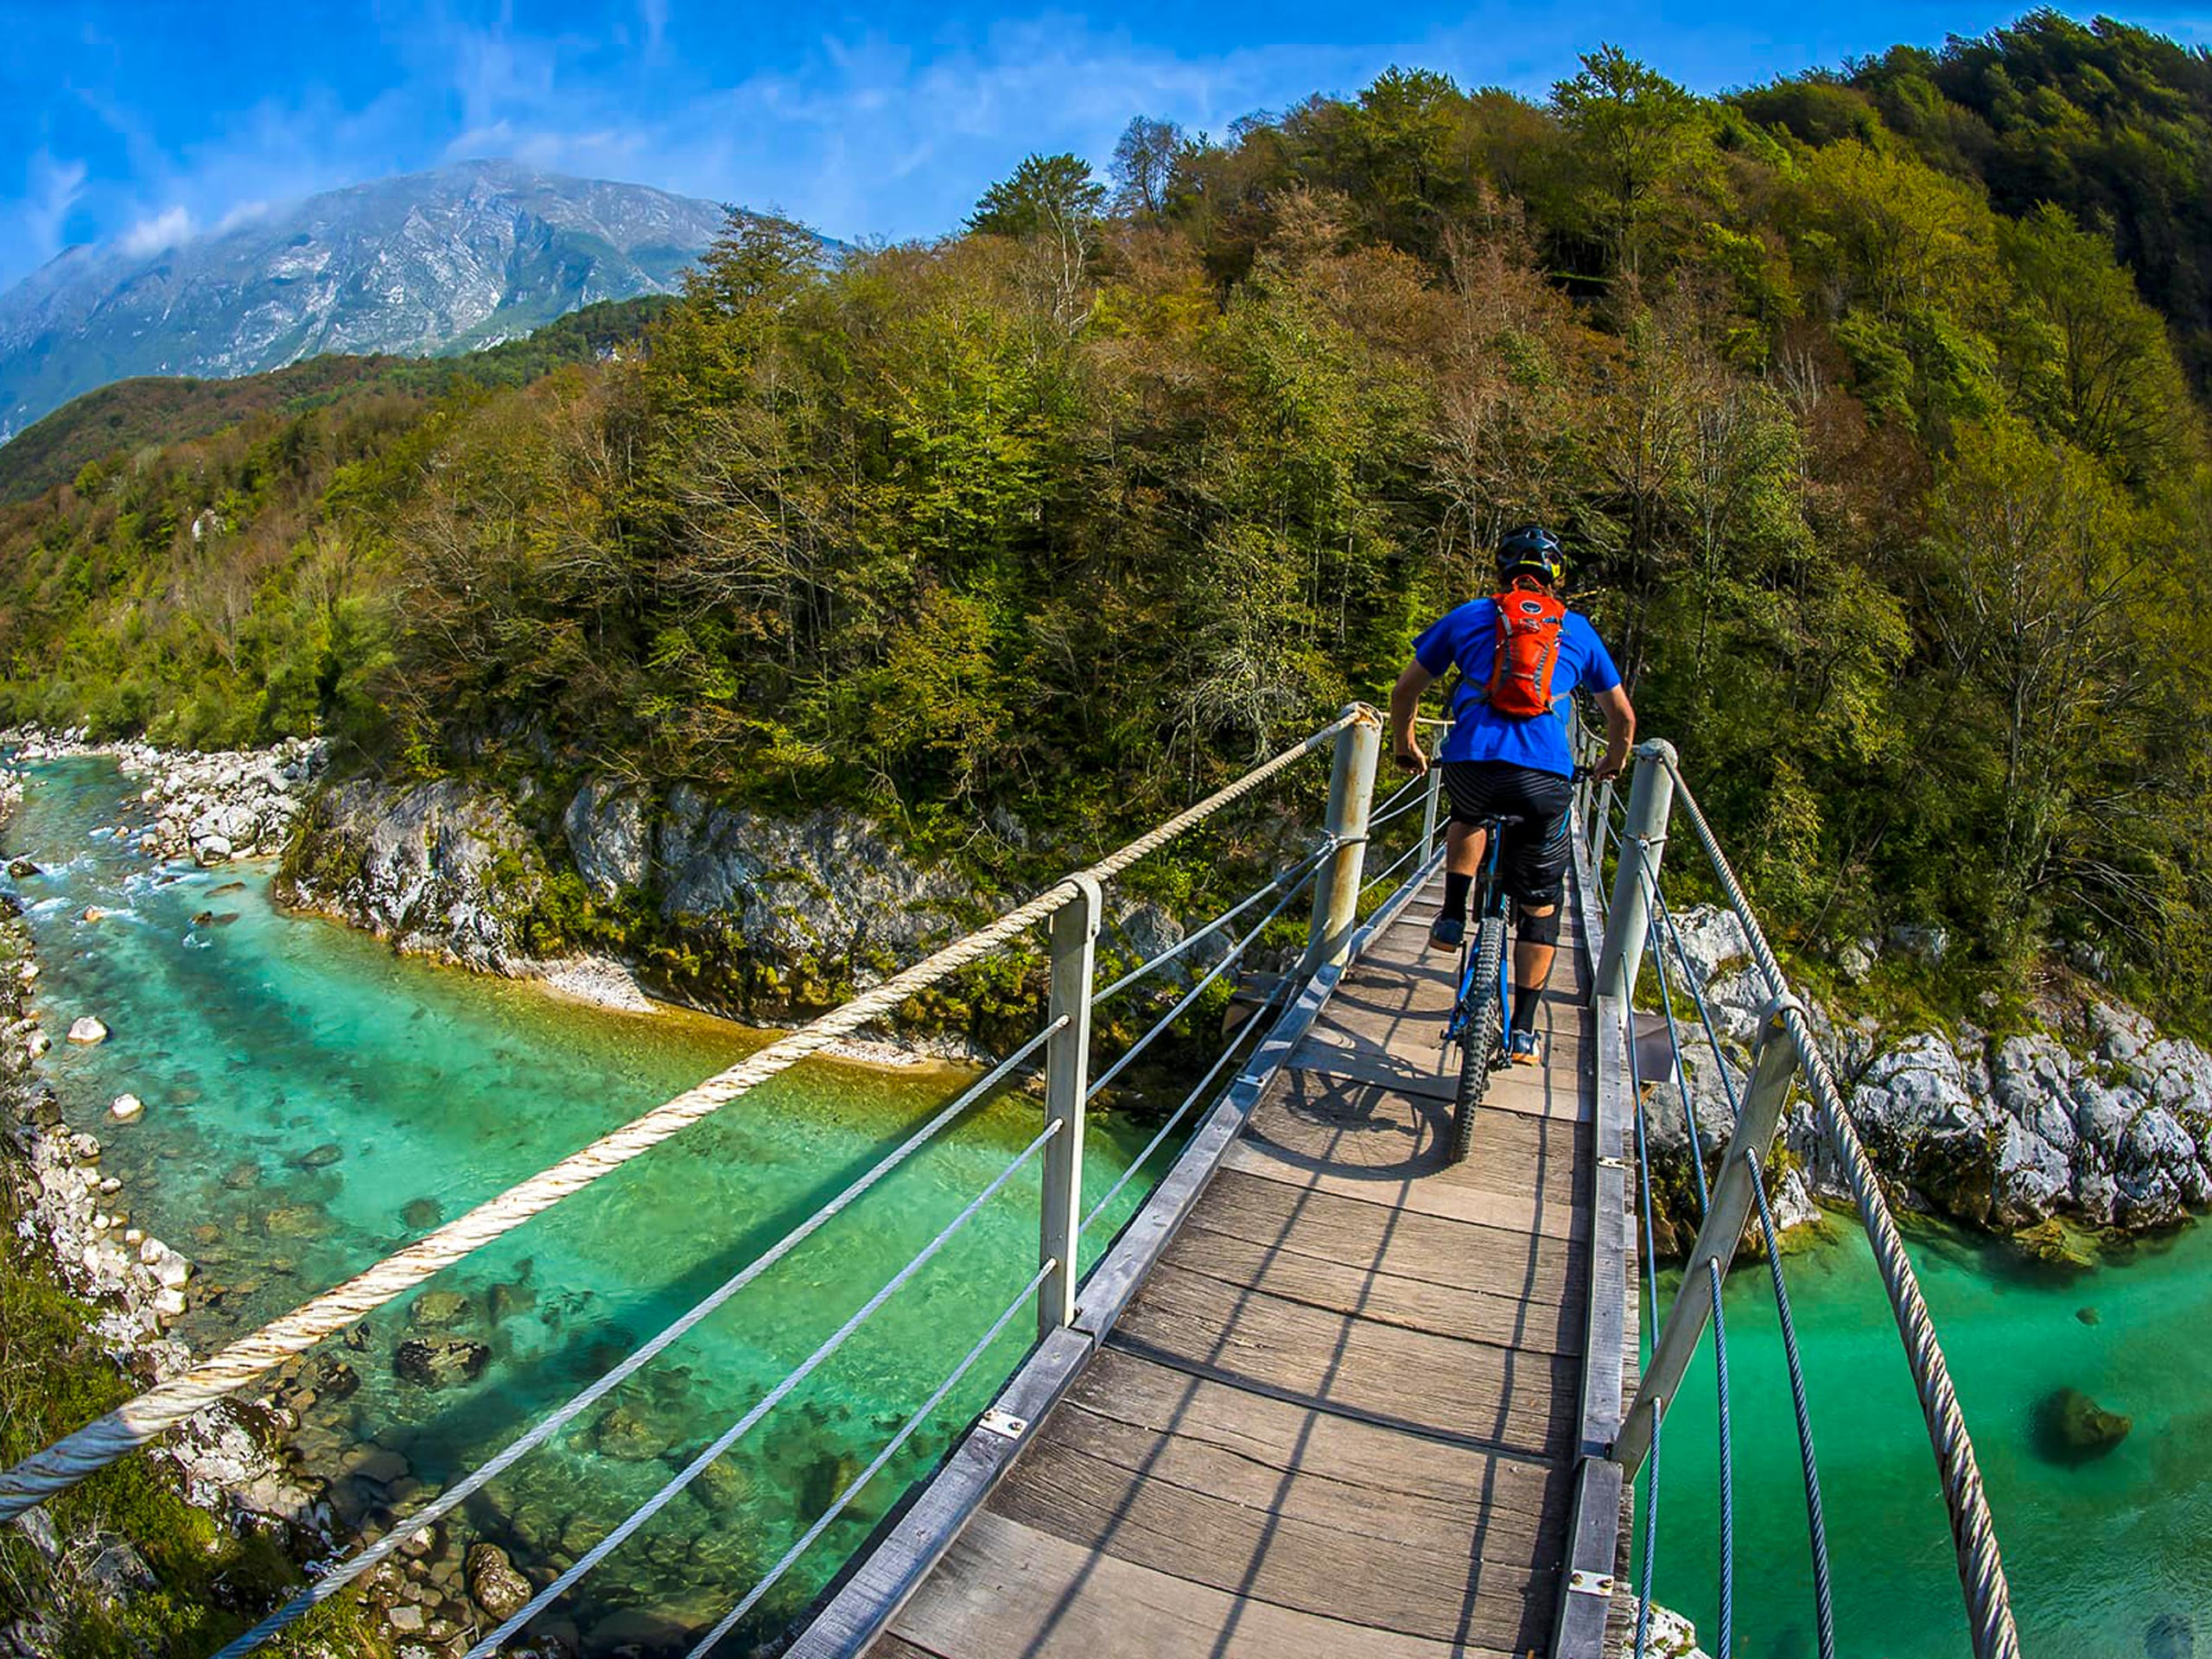 Bridge over the mountains river